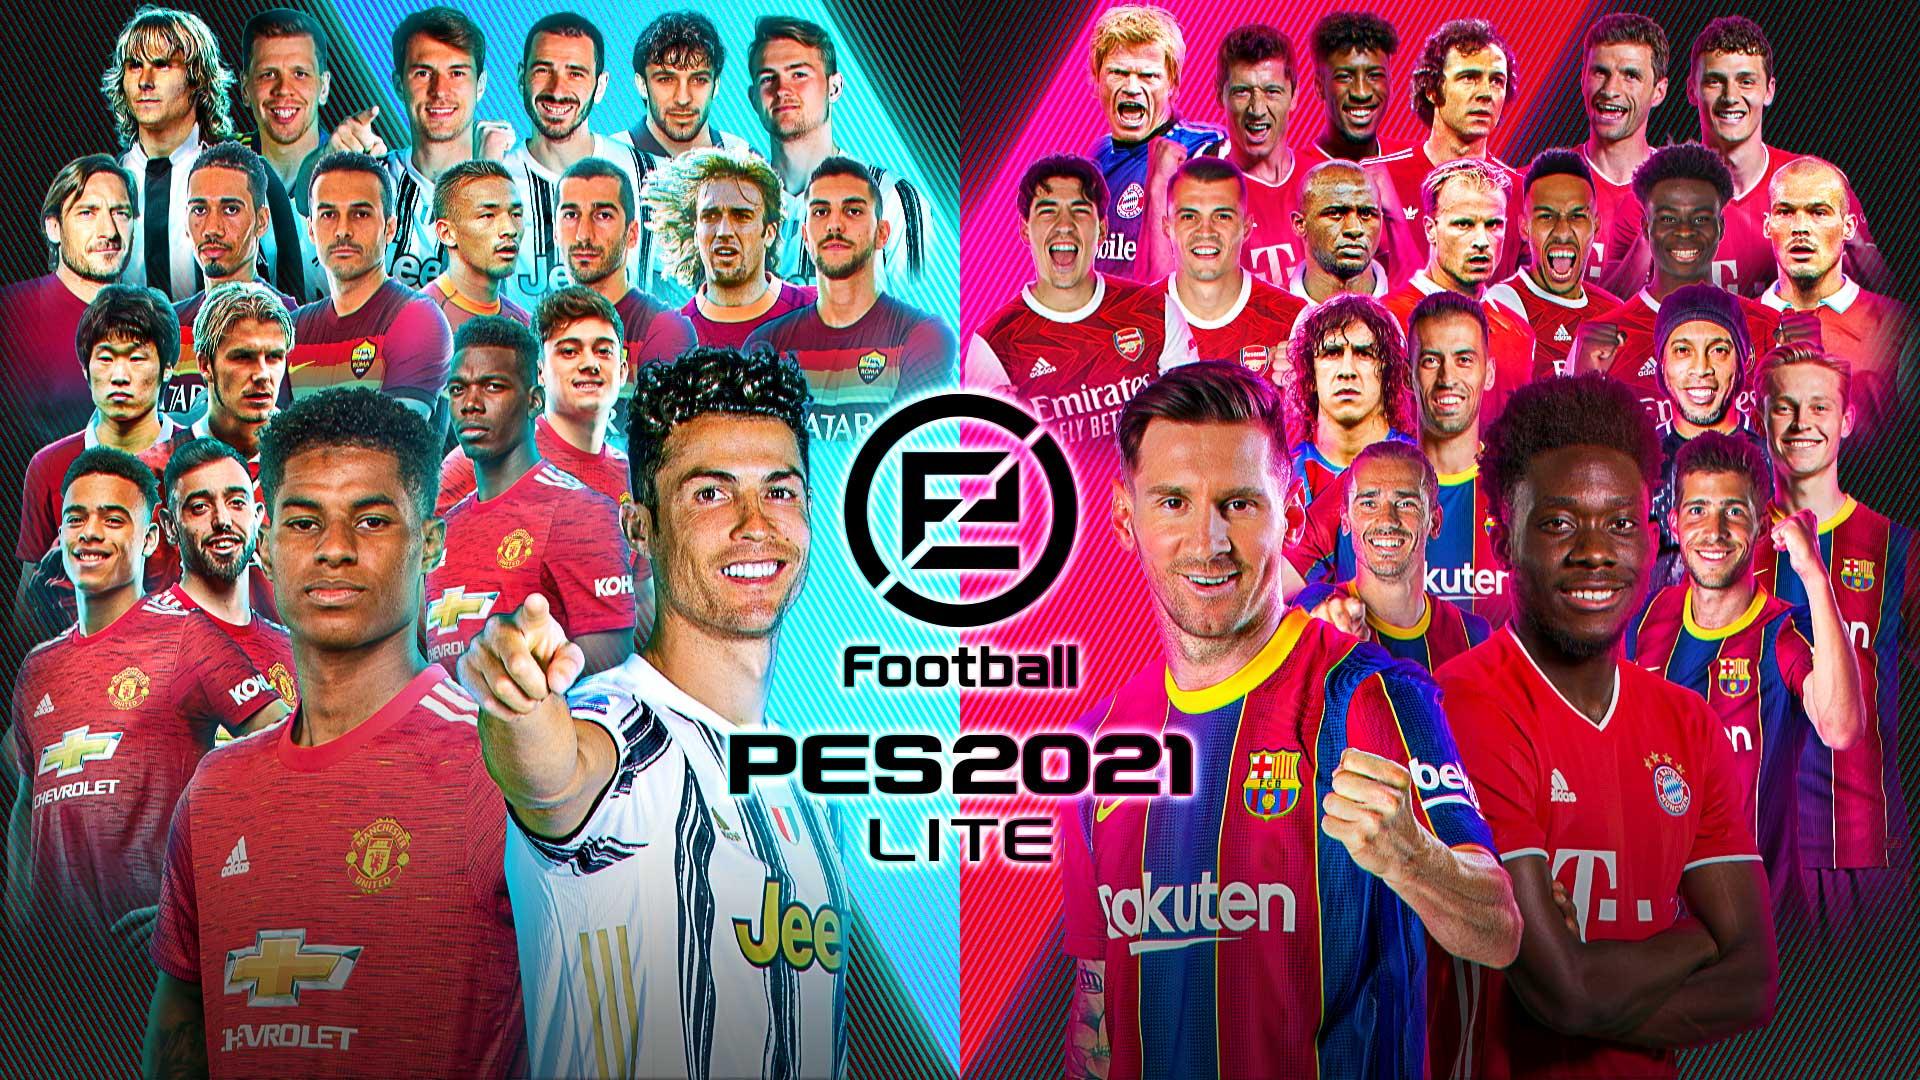 eFootball PES 2021 LITE 1920 1080 babt